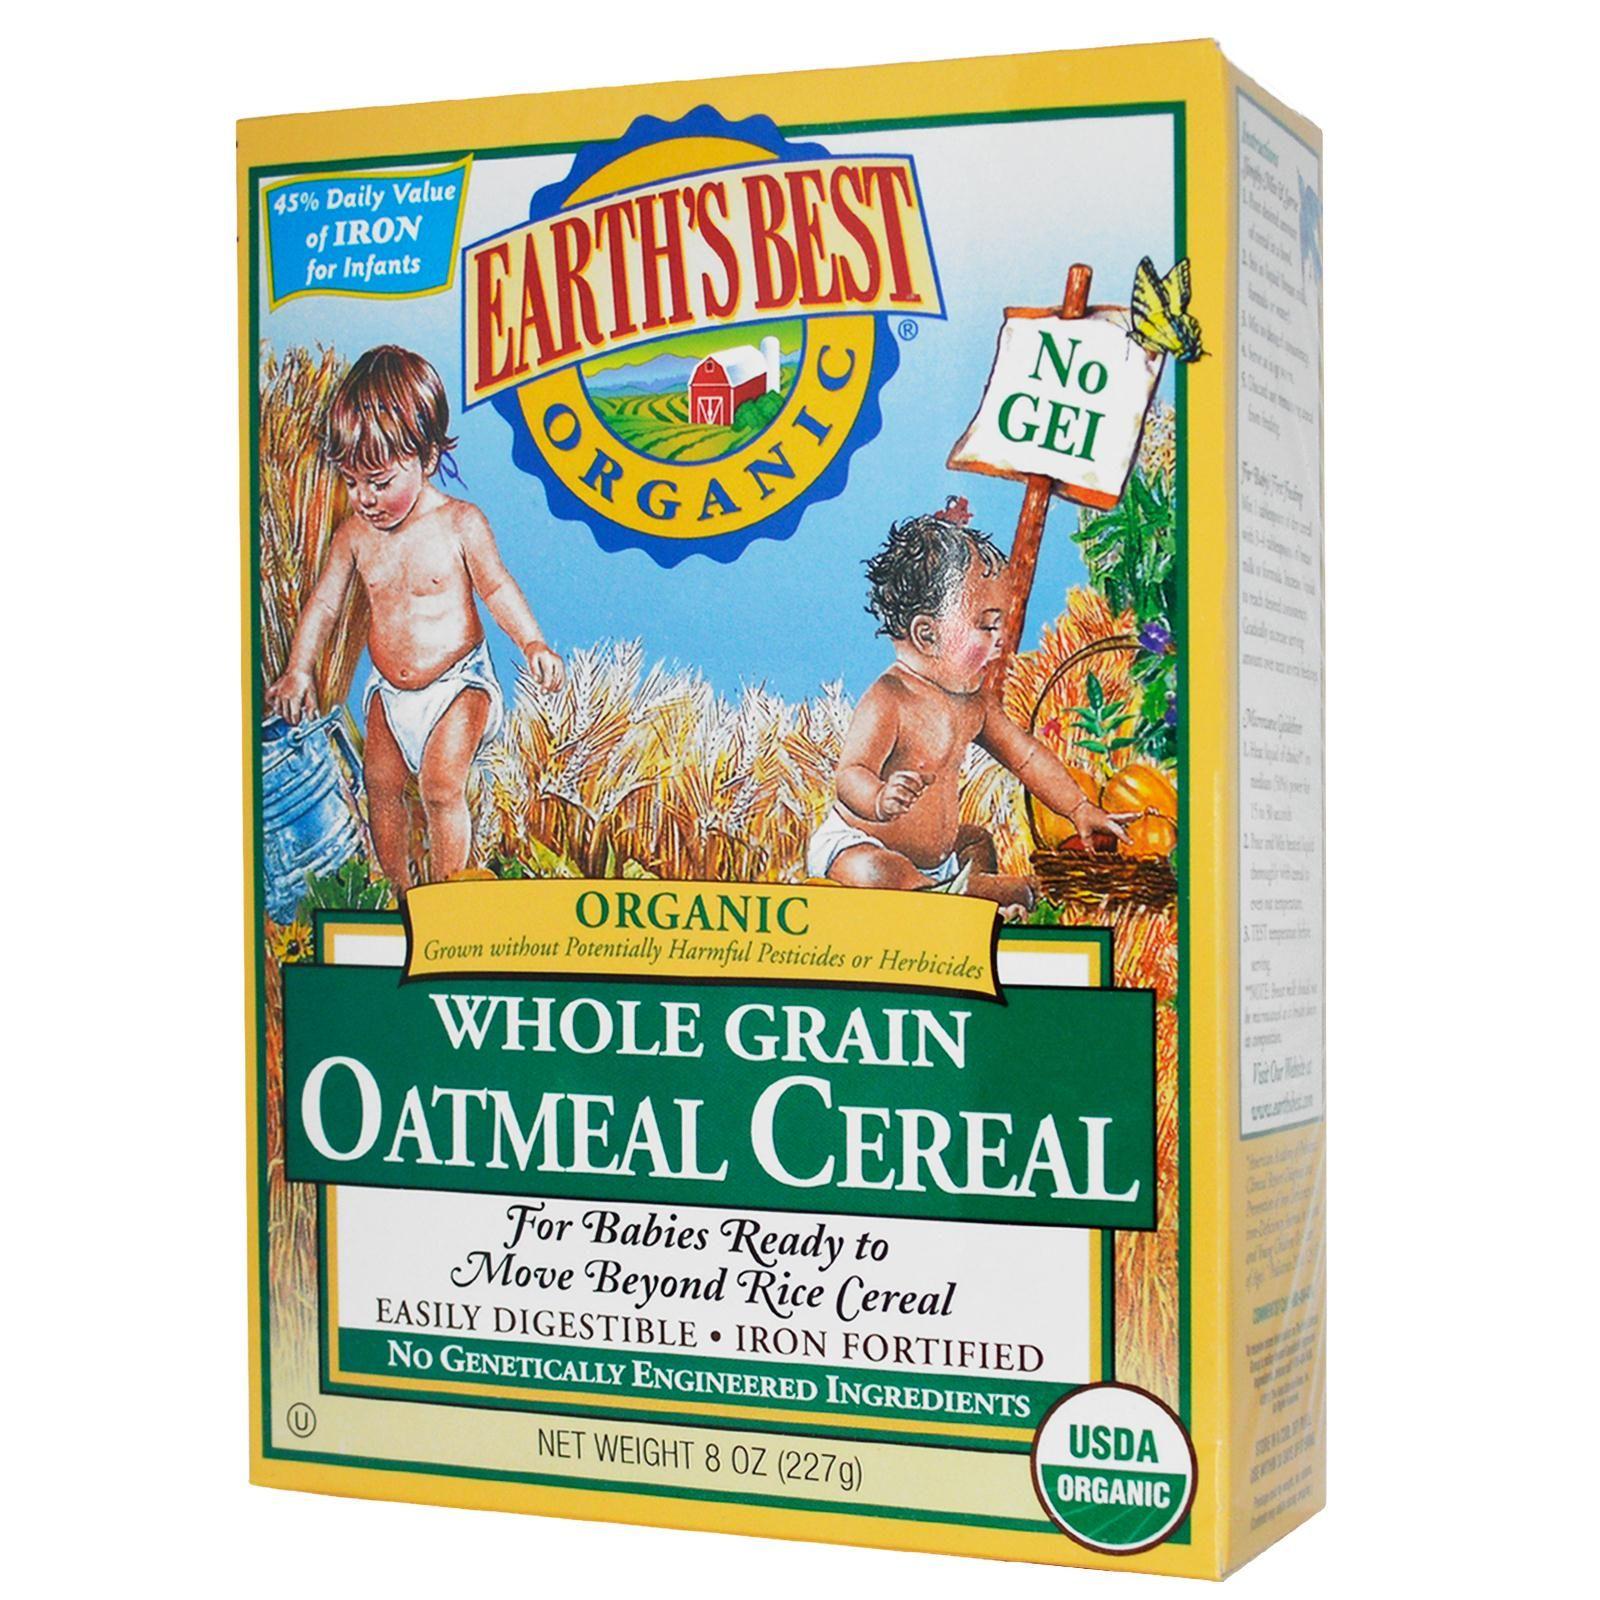 Earth's Best, Organic Whole Grain Oatmeal Cereal, 8 Oz